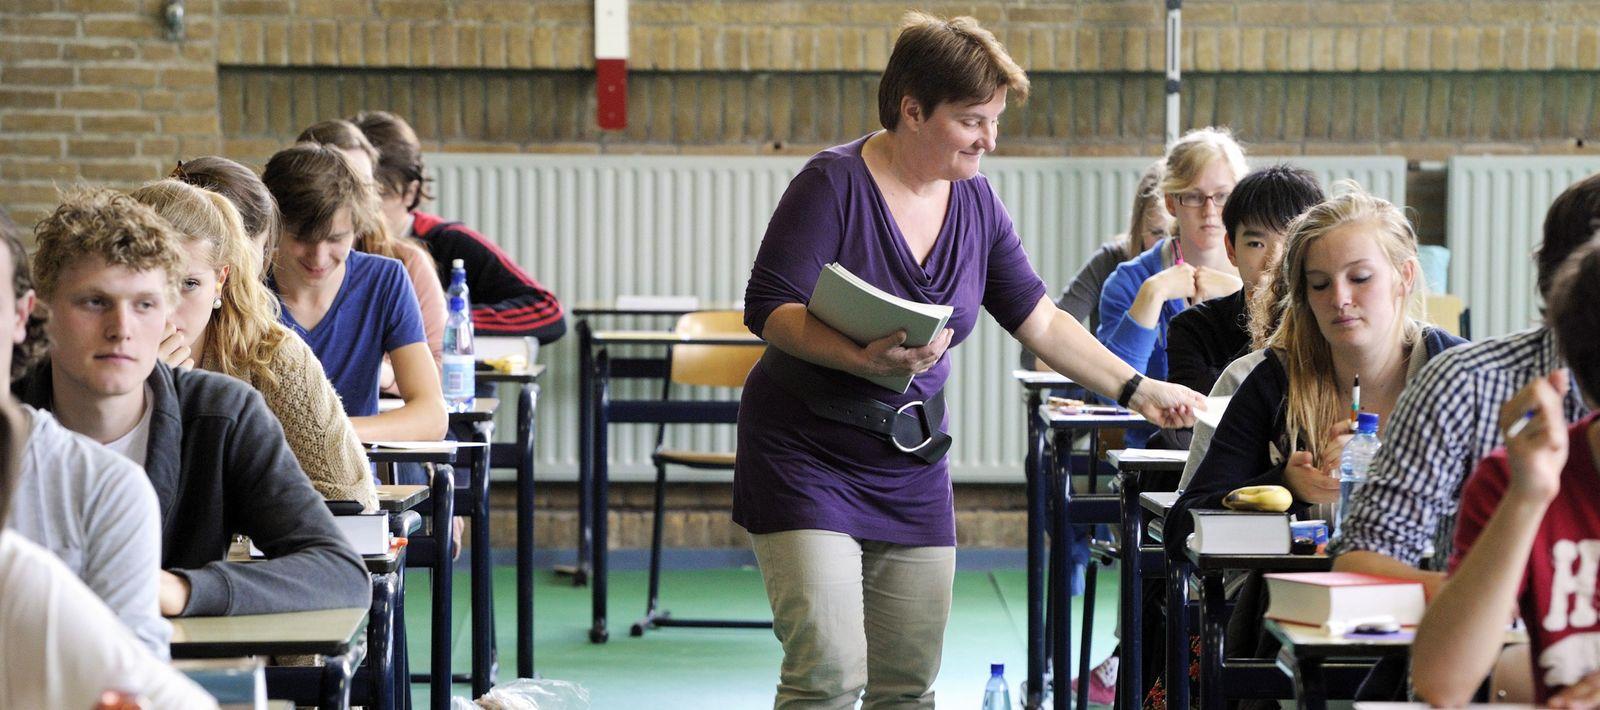 Holland / Schule / Schüler / Prüfung